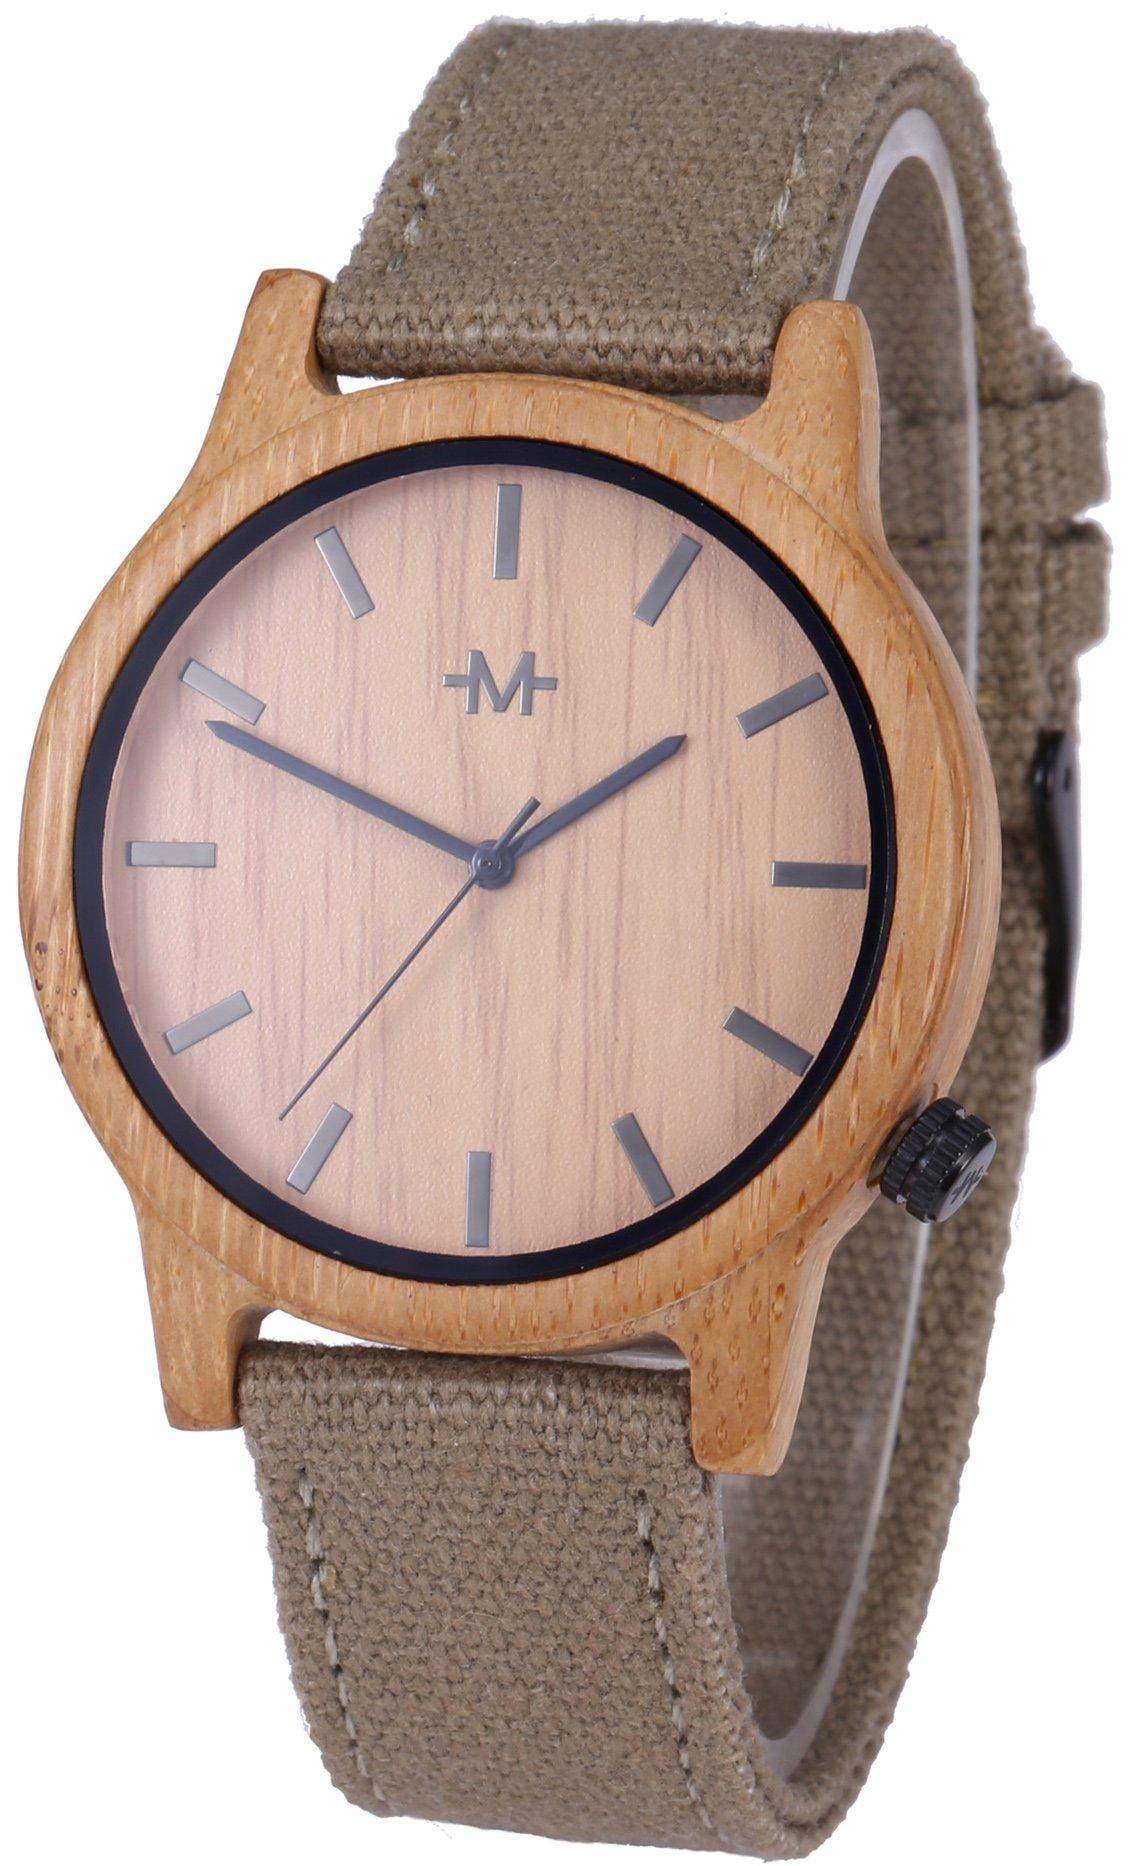 Marino Mens Wooden Watch - Wrist watches for Men - Dress Wood Watch (One Size, Khaki - Canvas Band) by Marino Avenue (Image #1)